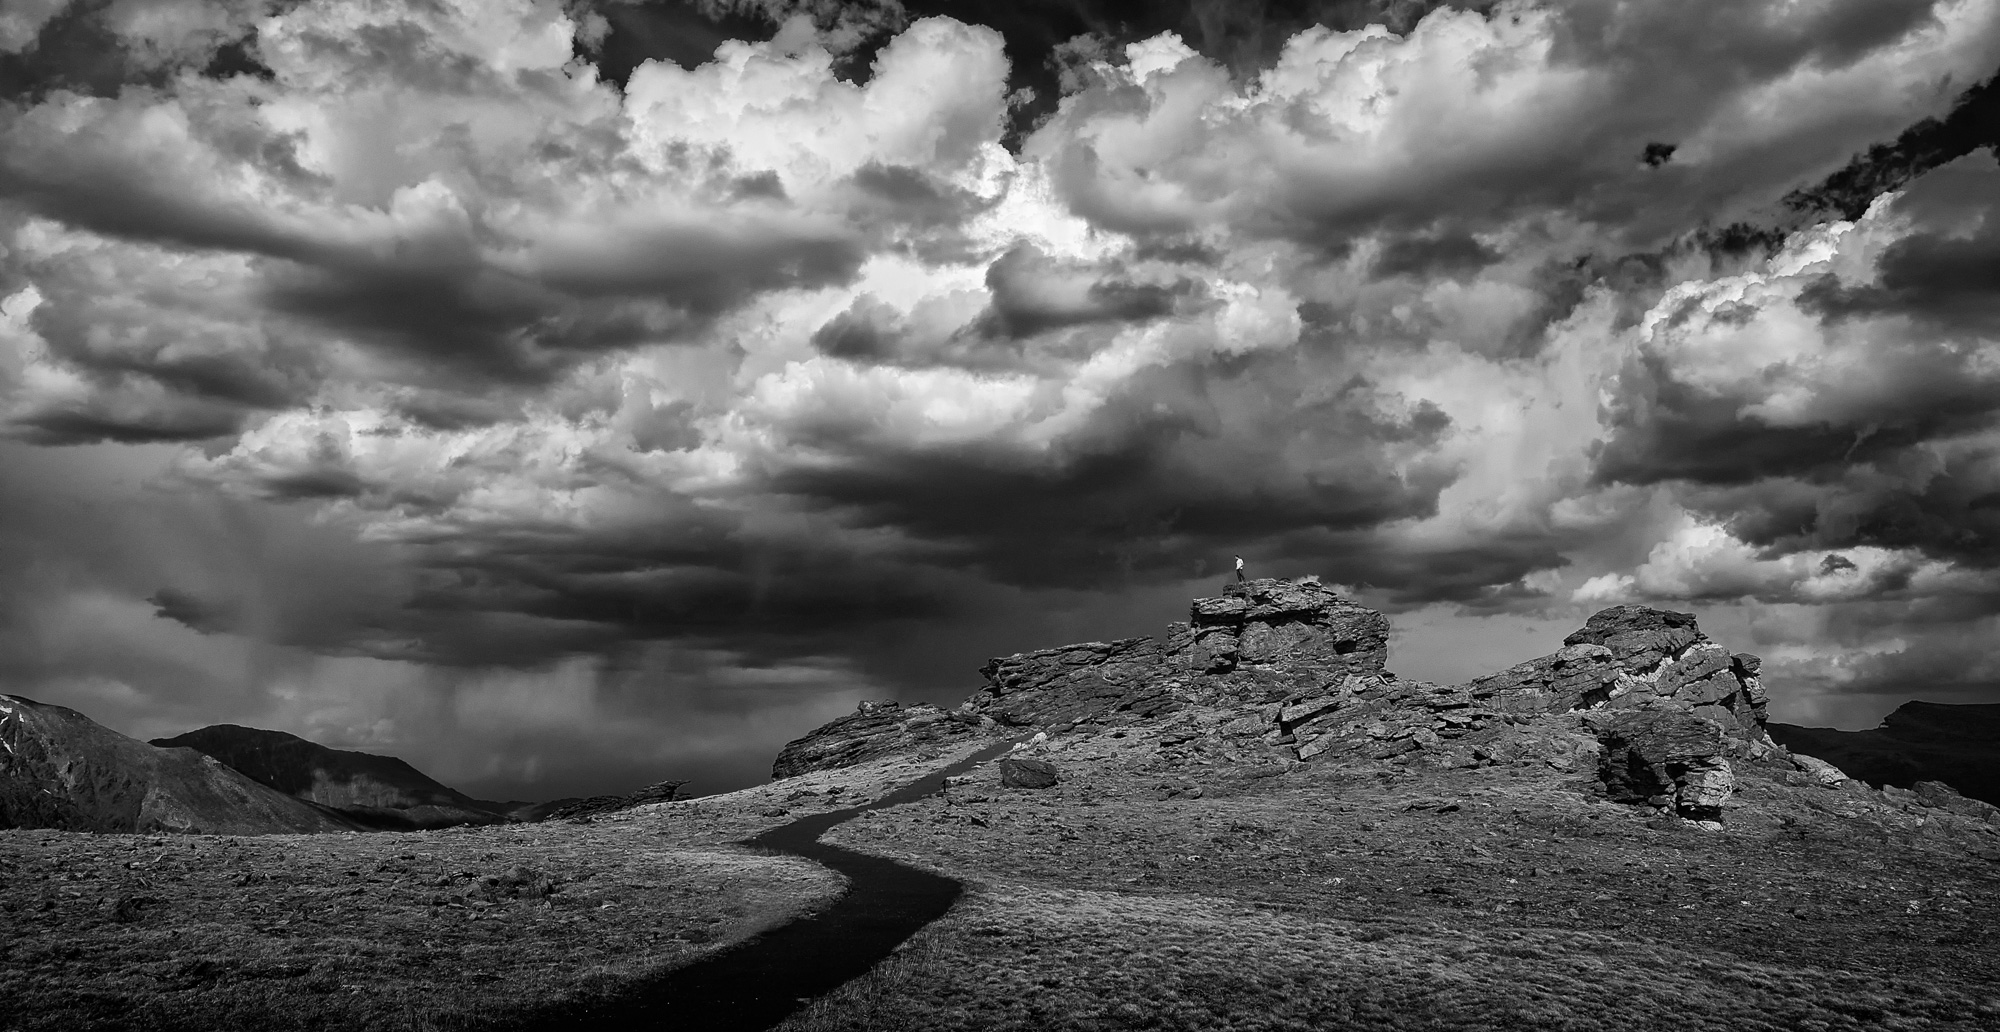 Facing the Storm, final version